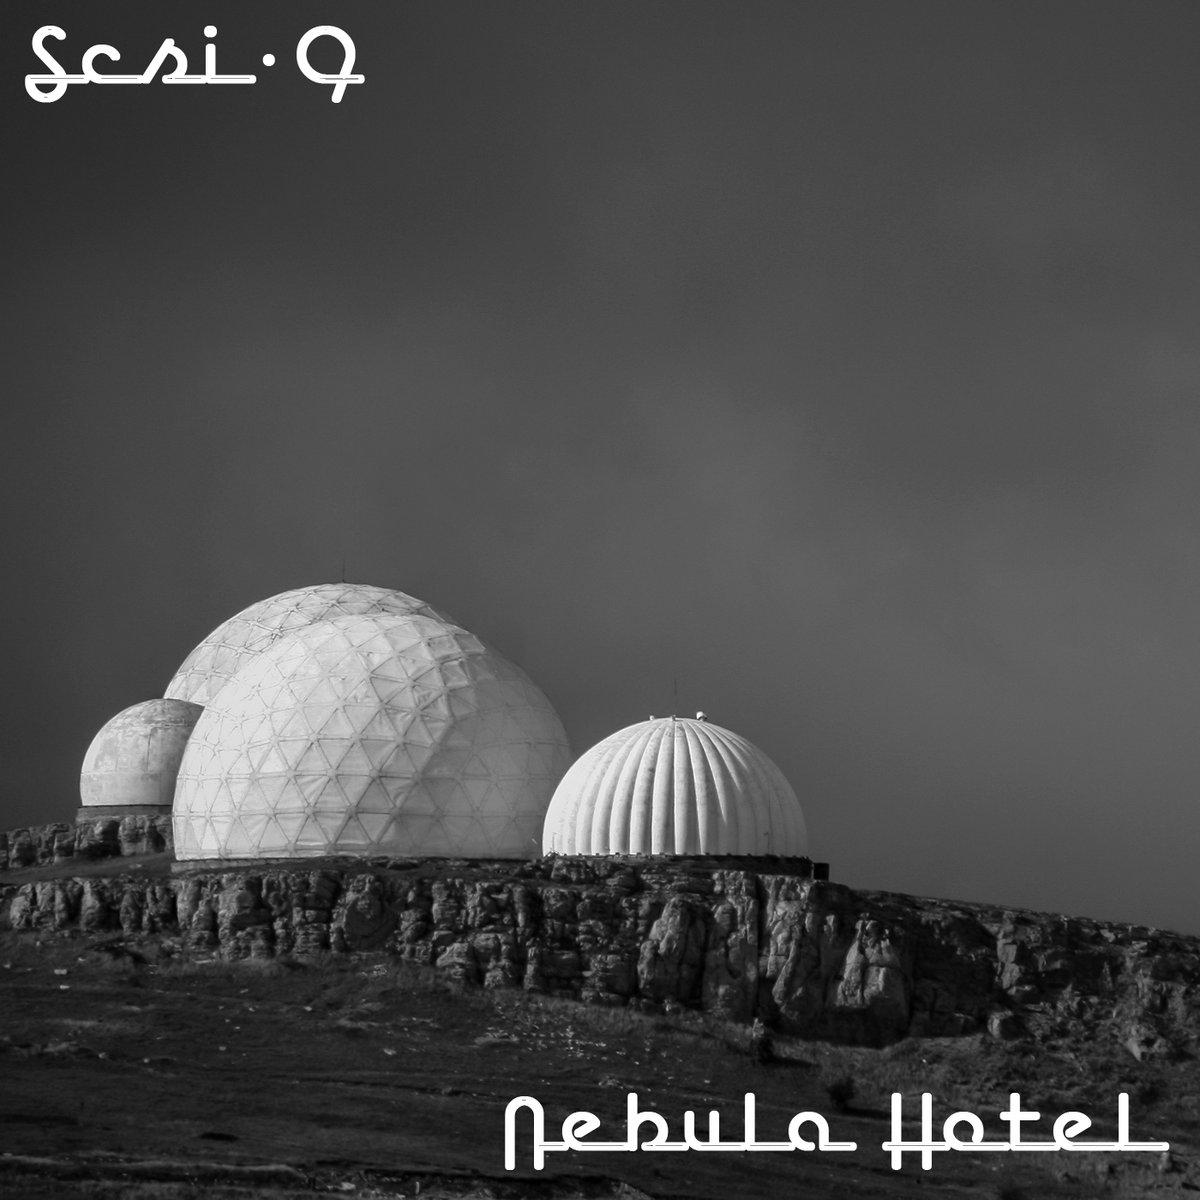 Scsi-9 — Nebula Hotel (Randomart, 2020)